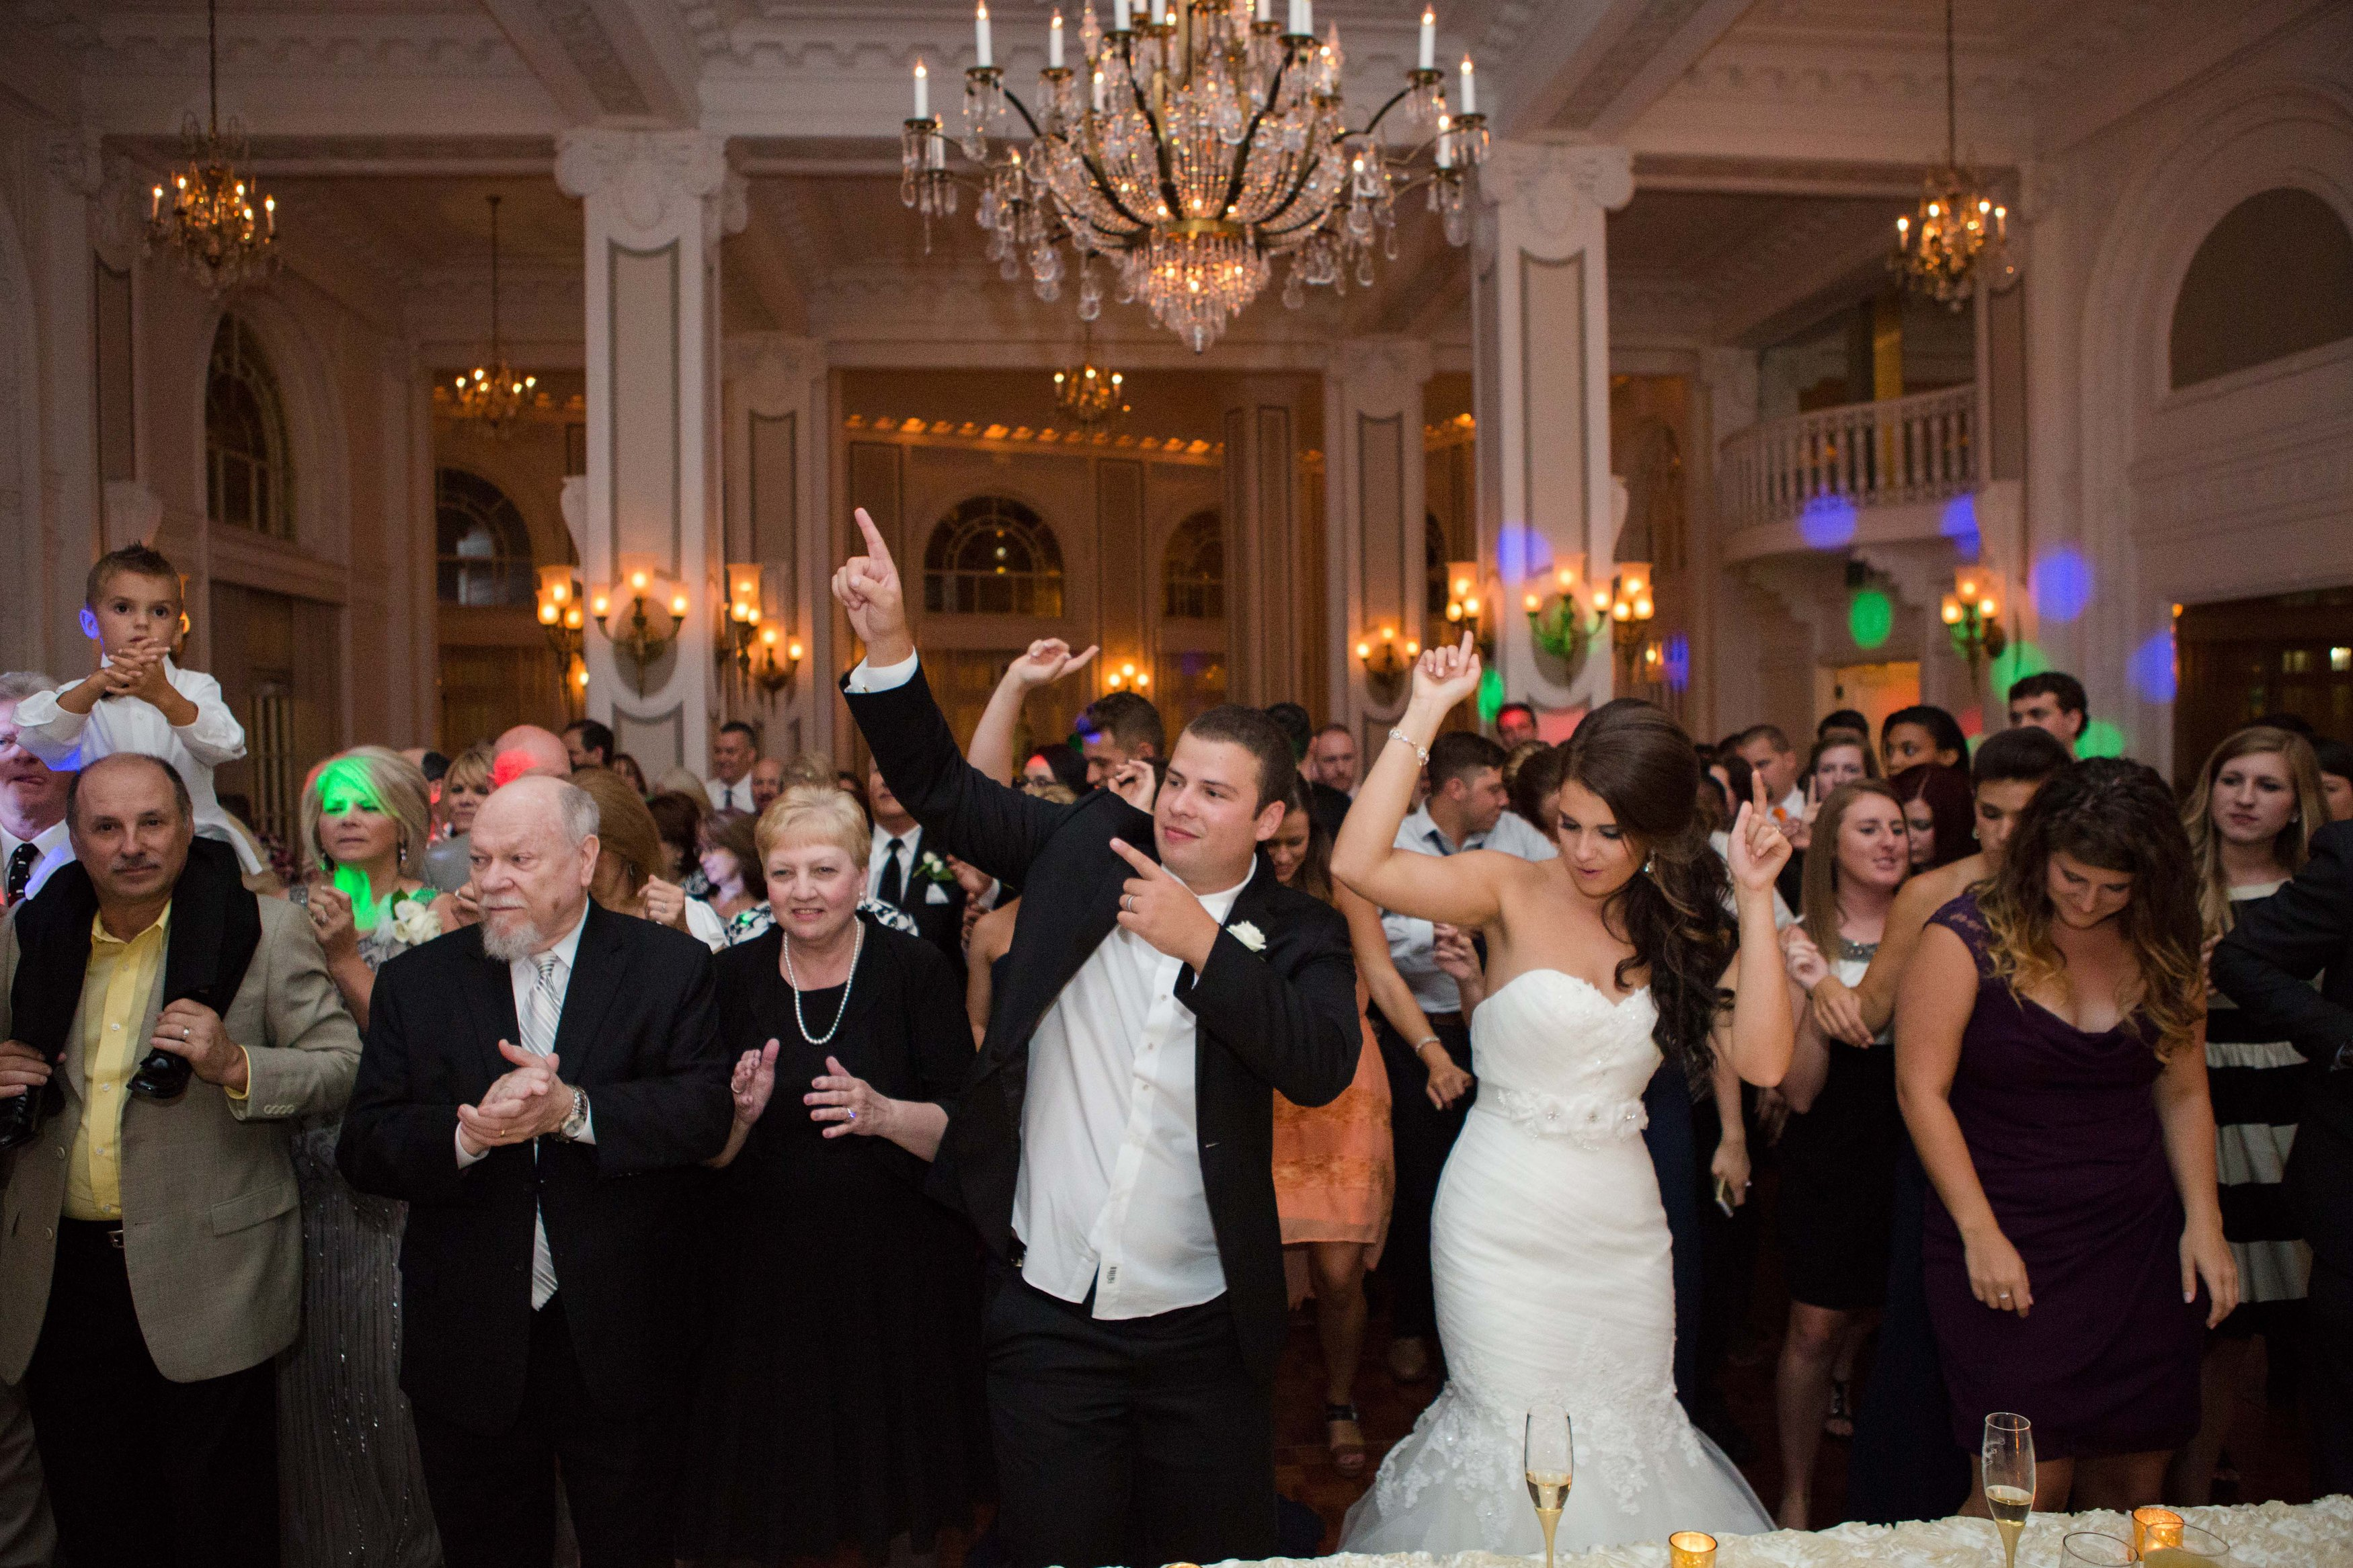 Courtney and Jordan s Wedding-C J 3-0105.jpg